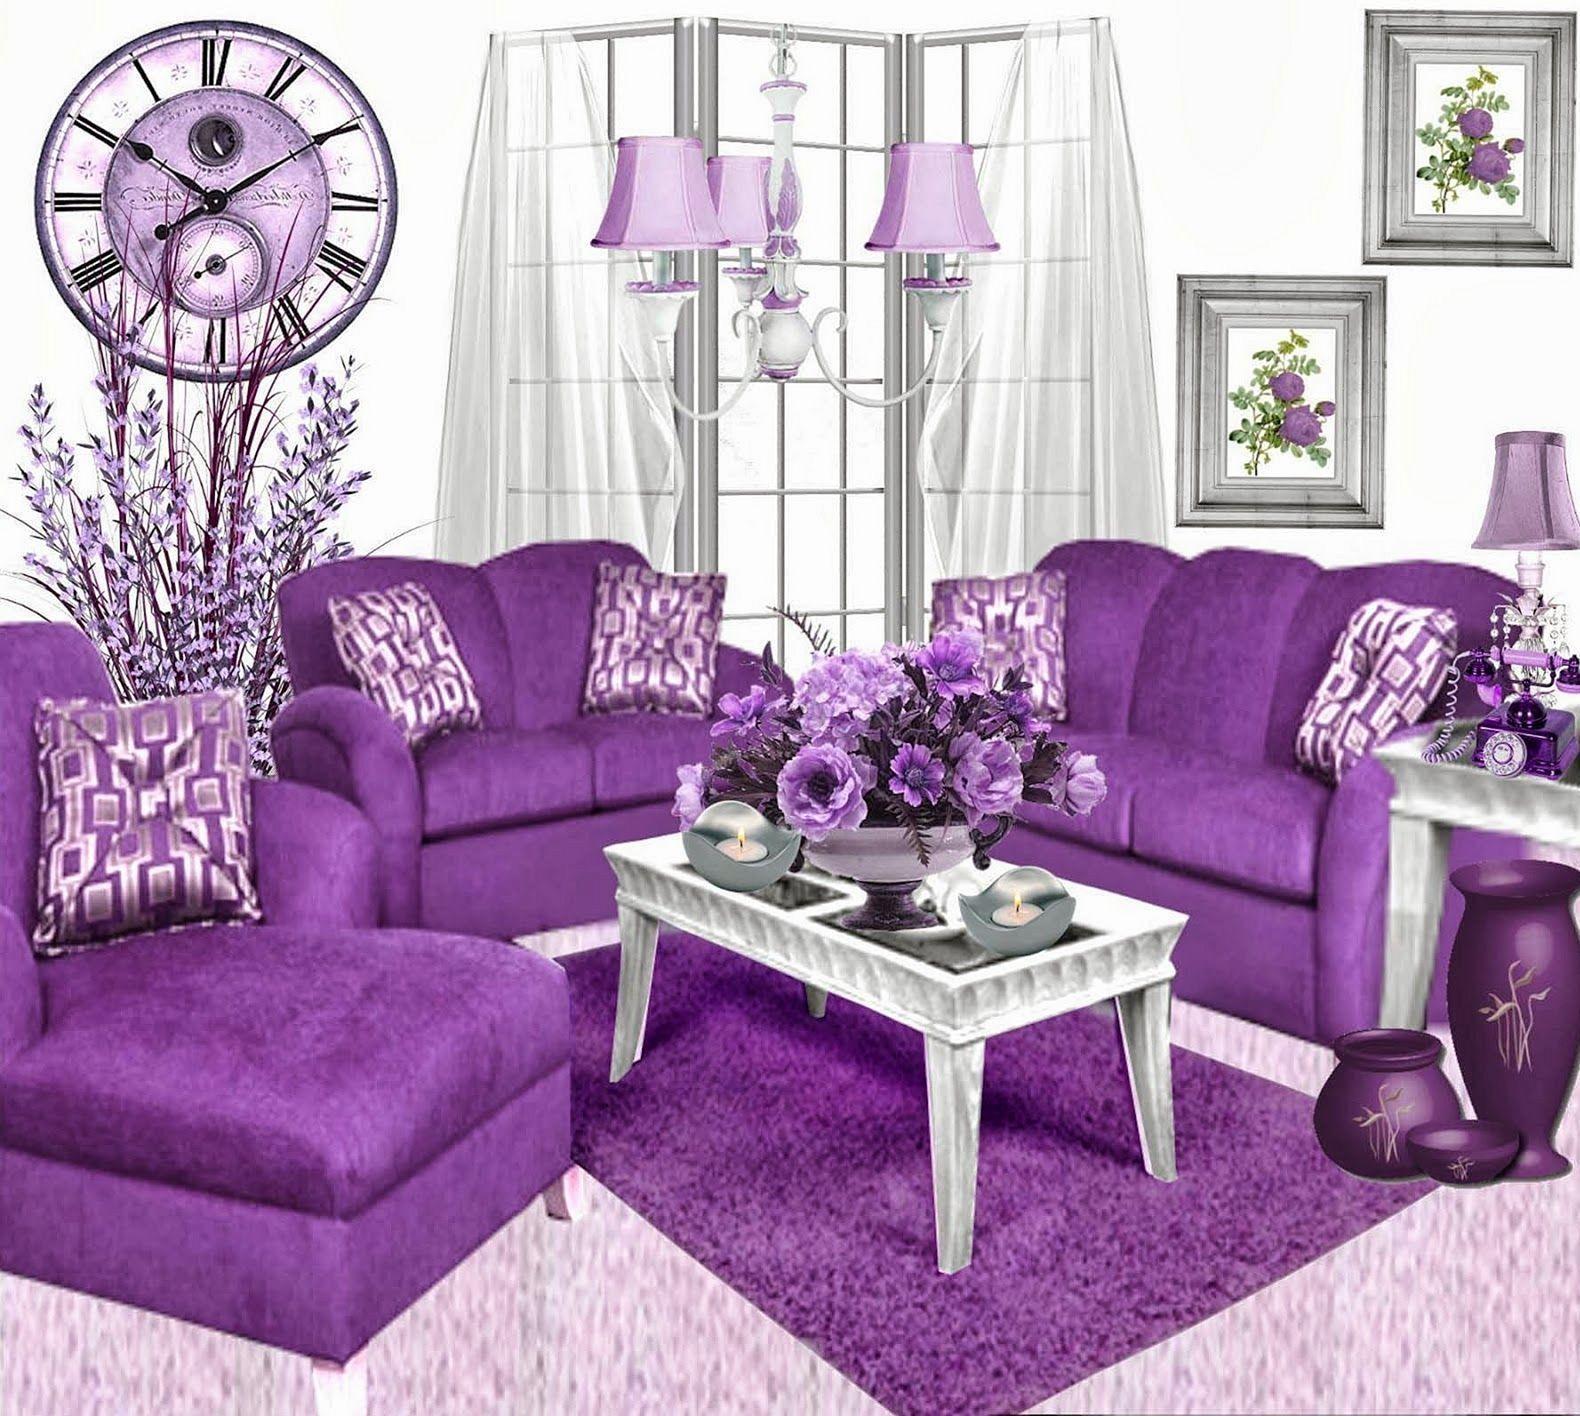 Epic 25 Amazing Purple Furniture Ideas For A Mysterious Room Https Freshouz Com 25 Amazing Purple Furniture I Purple Living Room Purple Furniture Purple Home